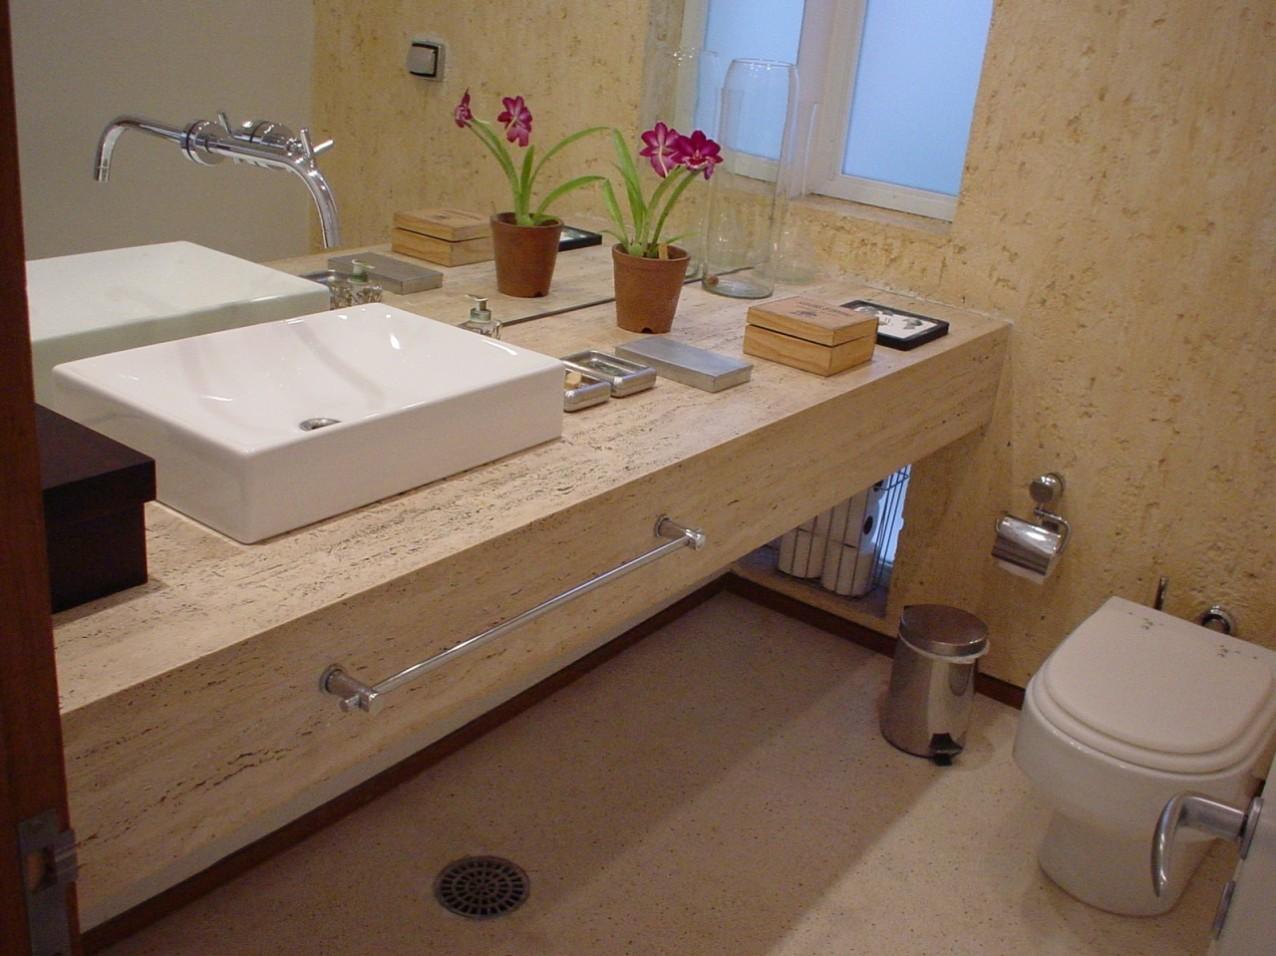 Residencial Alto da Boa Vista - Lavabo